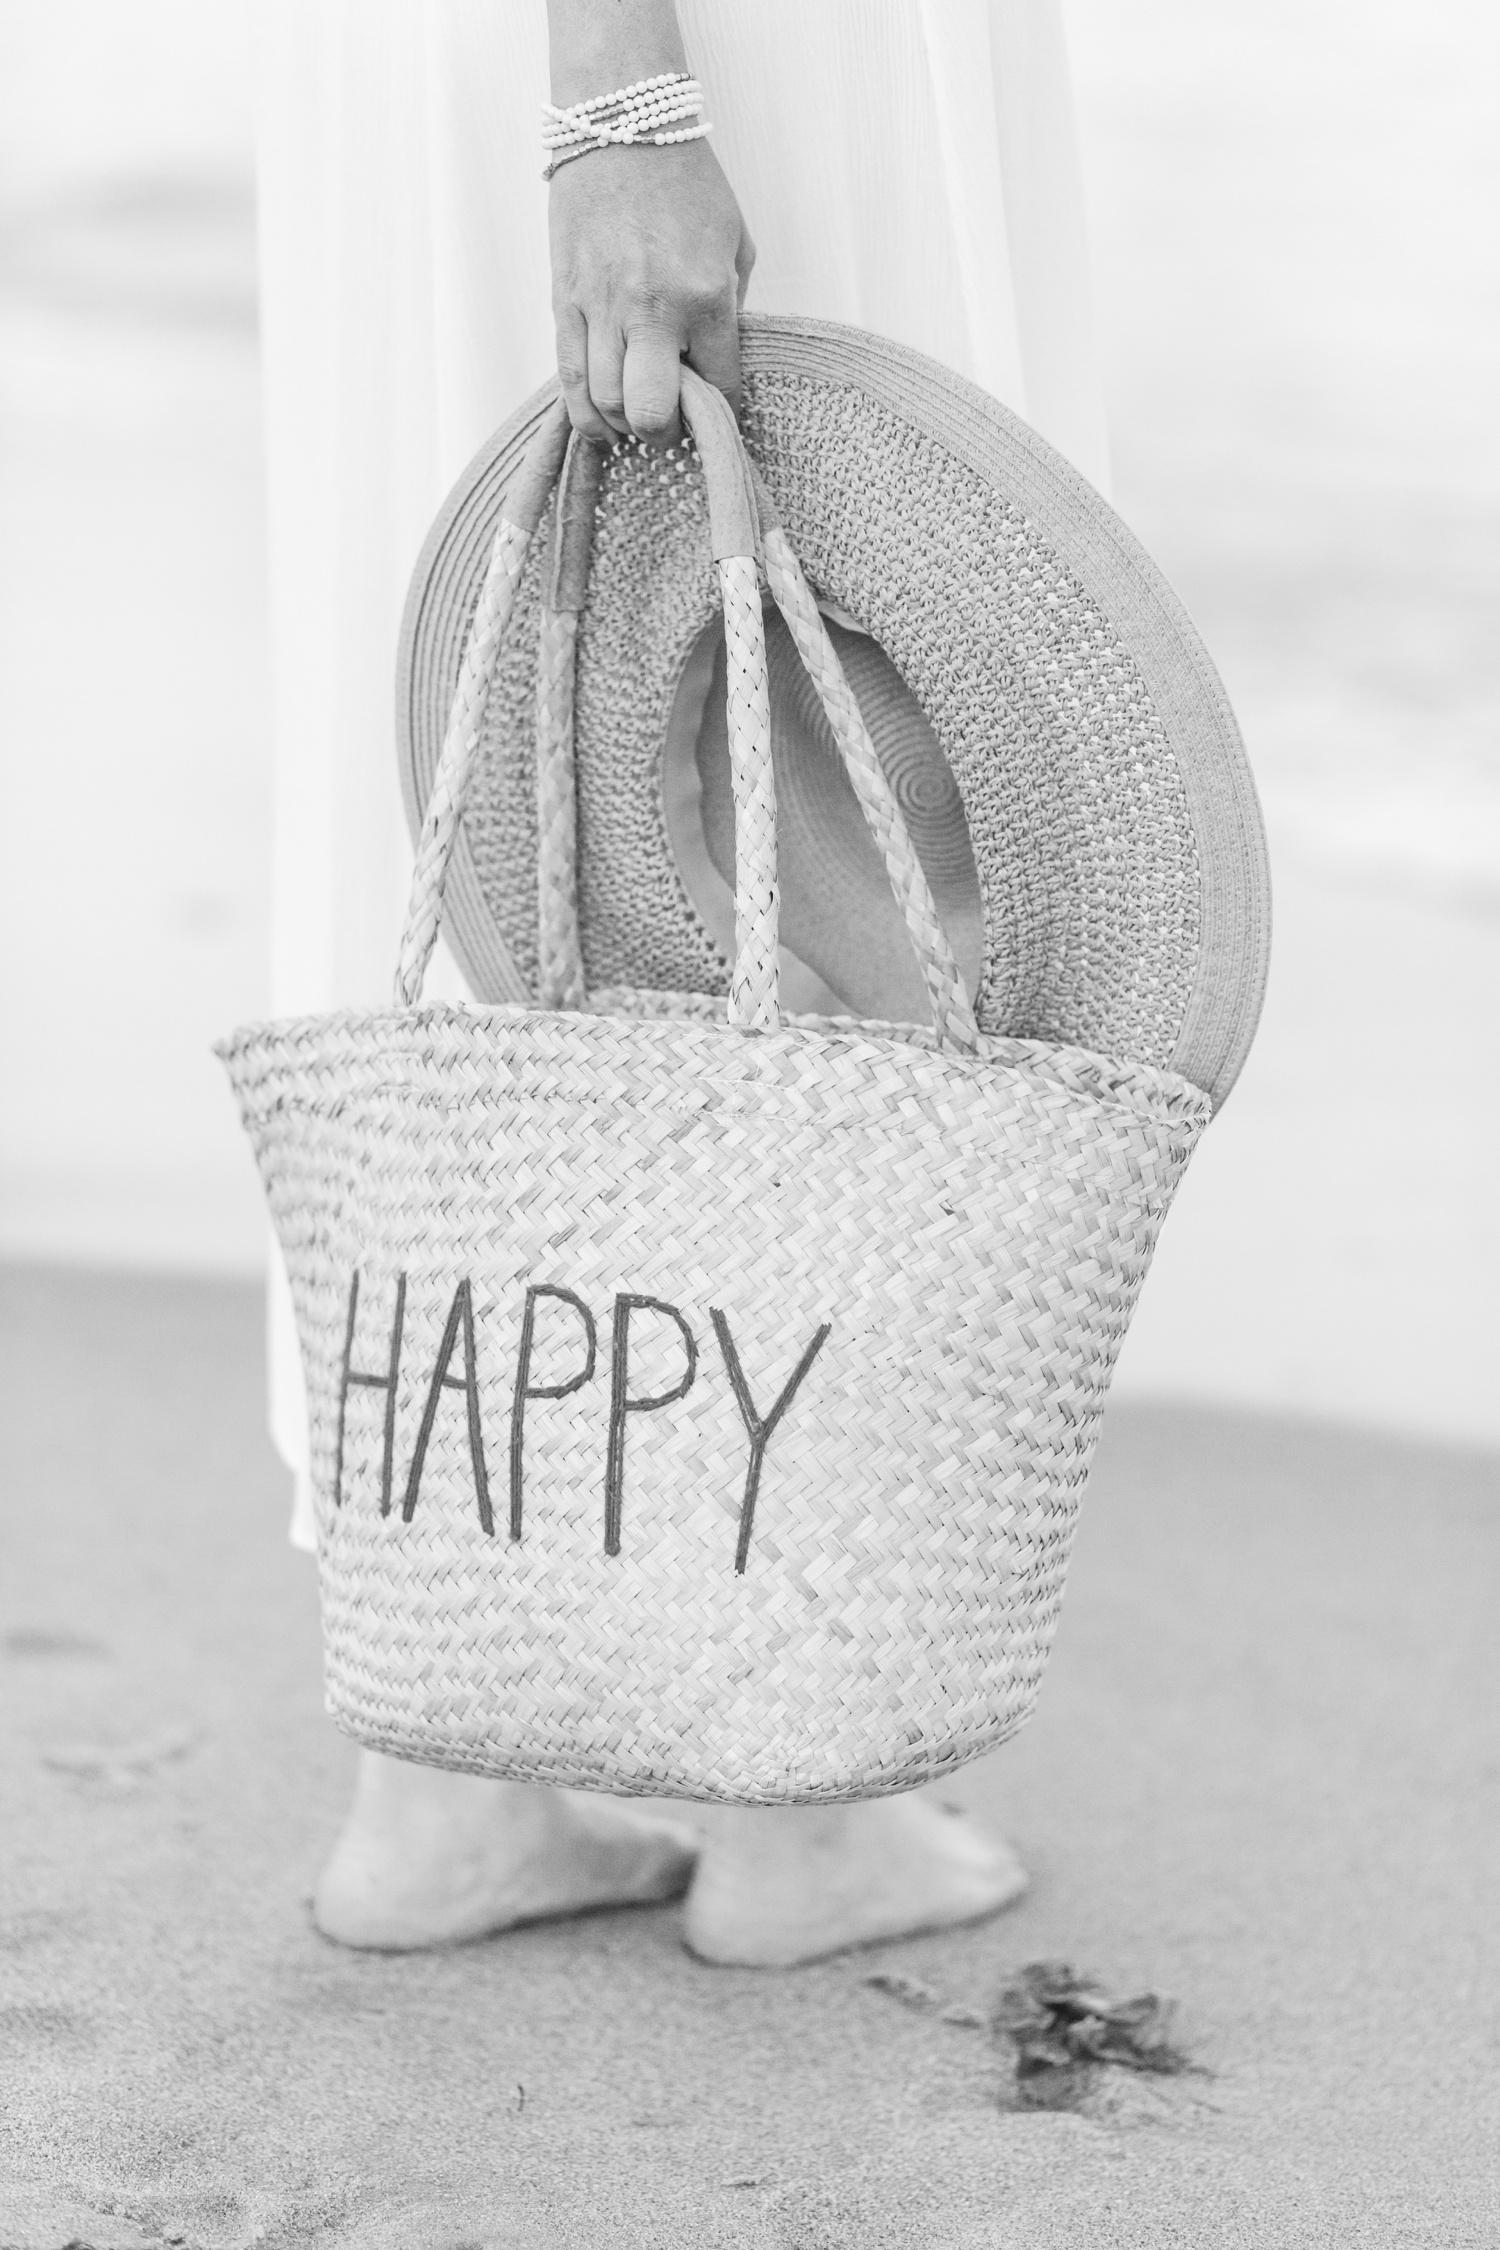 lifestyle-headshots-jennings-beach-fairfield-connecticut-top-ct-nyc-wedding-engagement-photographer-shaina-lee-photography-photo